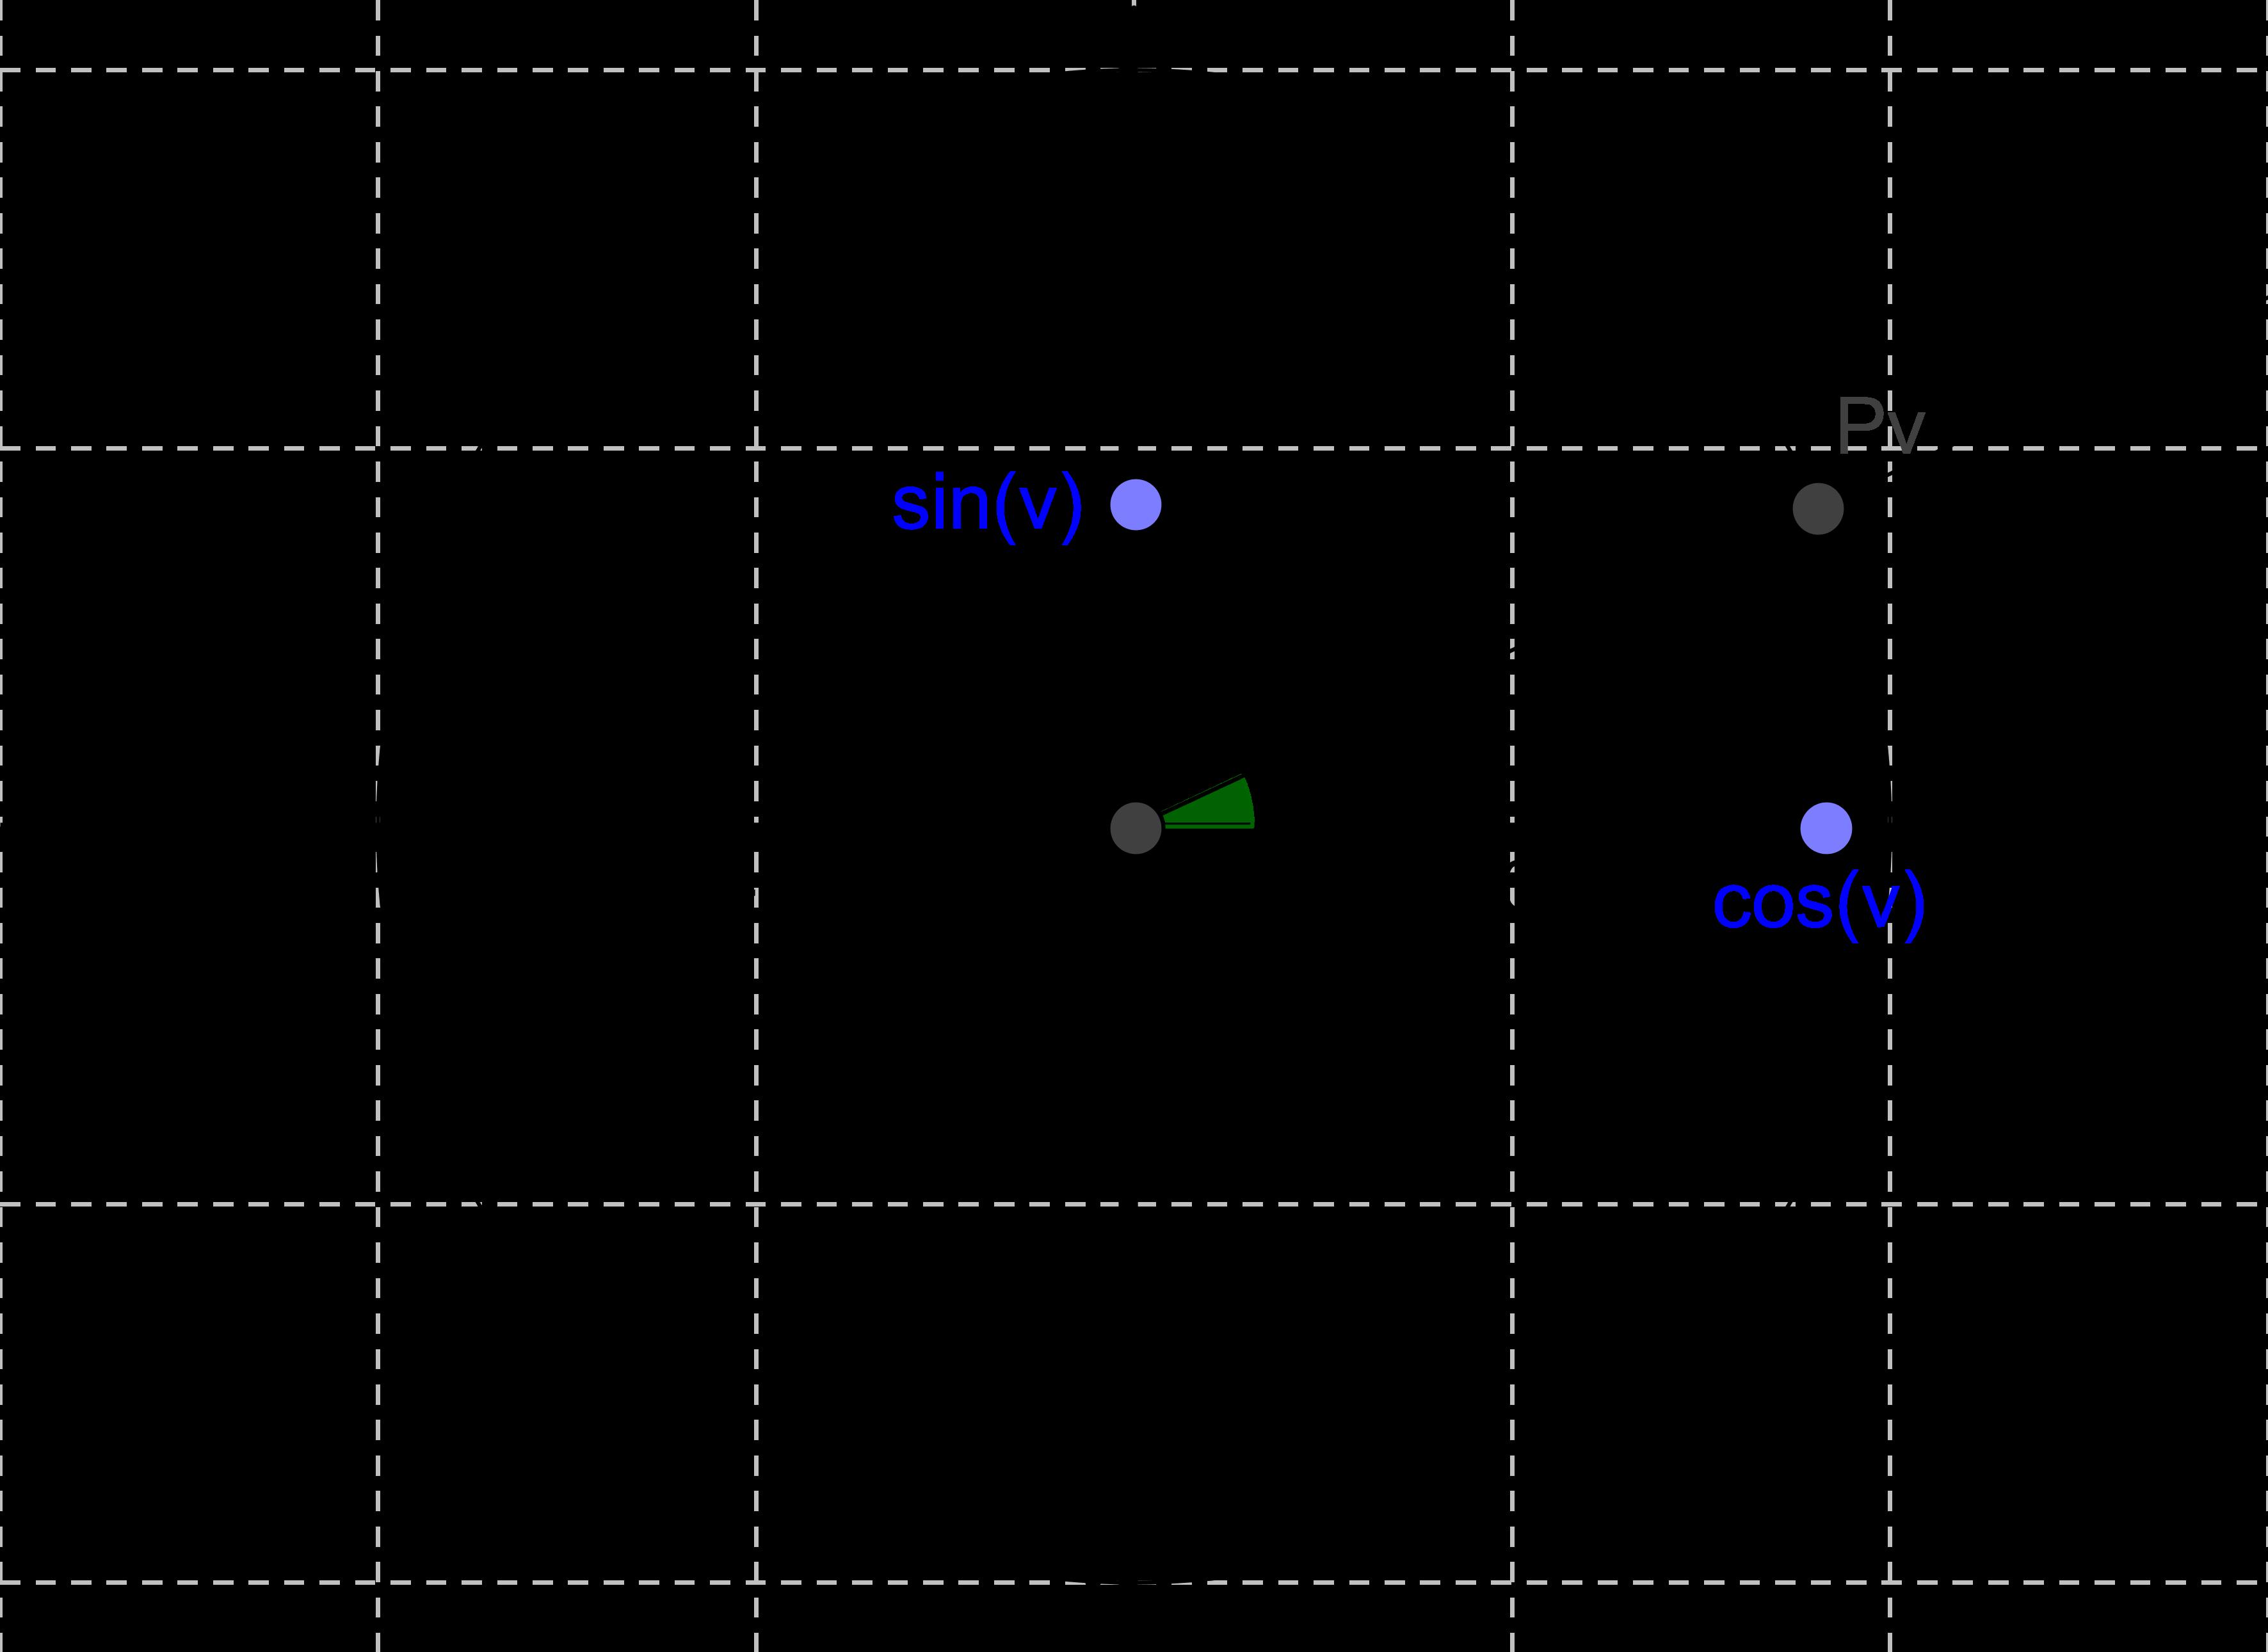 66faf95a039 Cosinus og sinus (Matematik C, Trigonometri) – Webmatematik